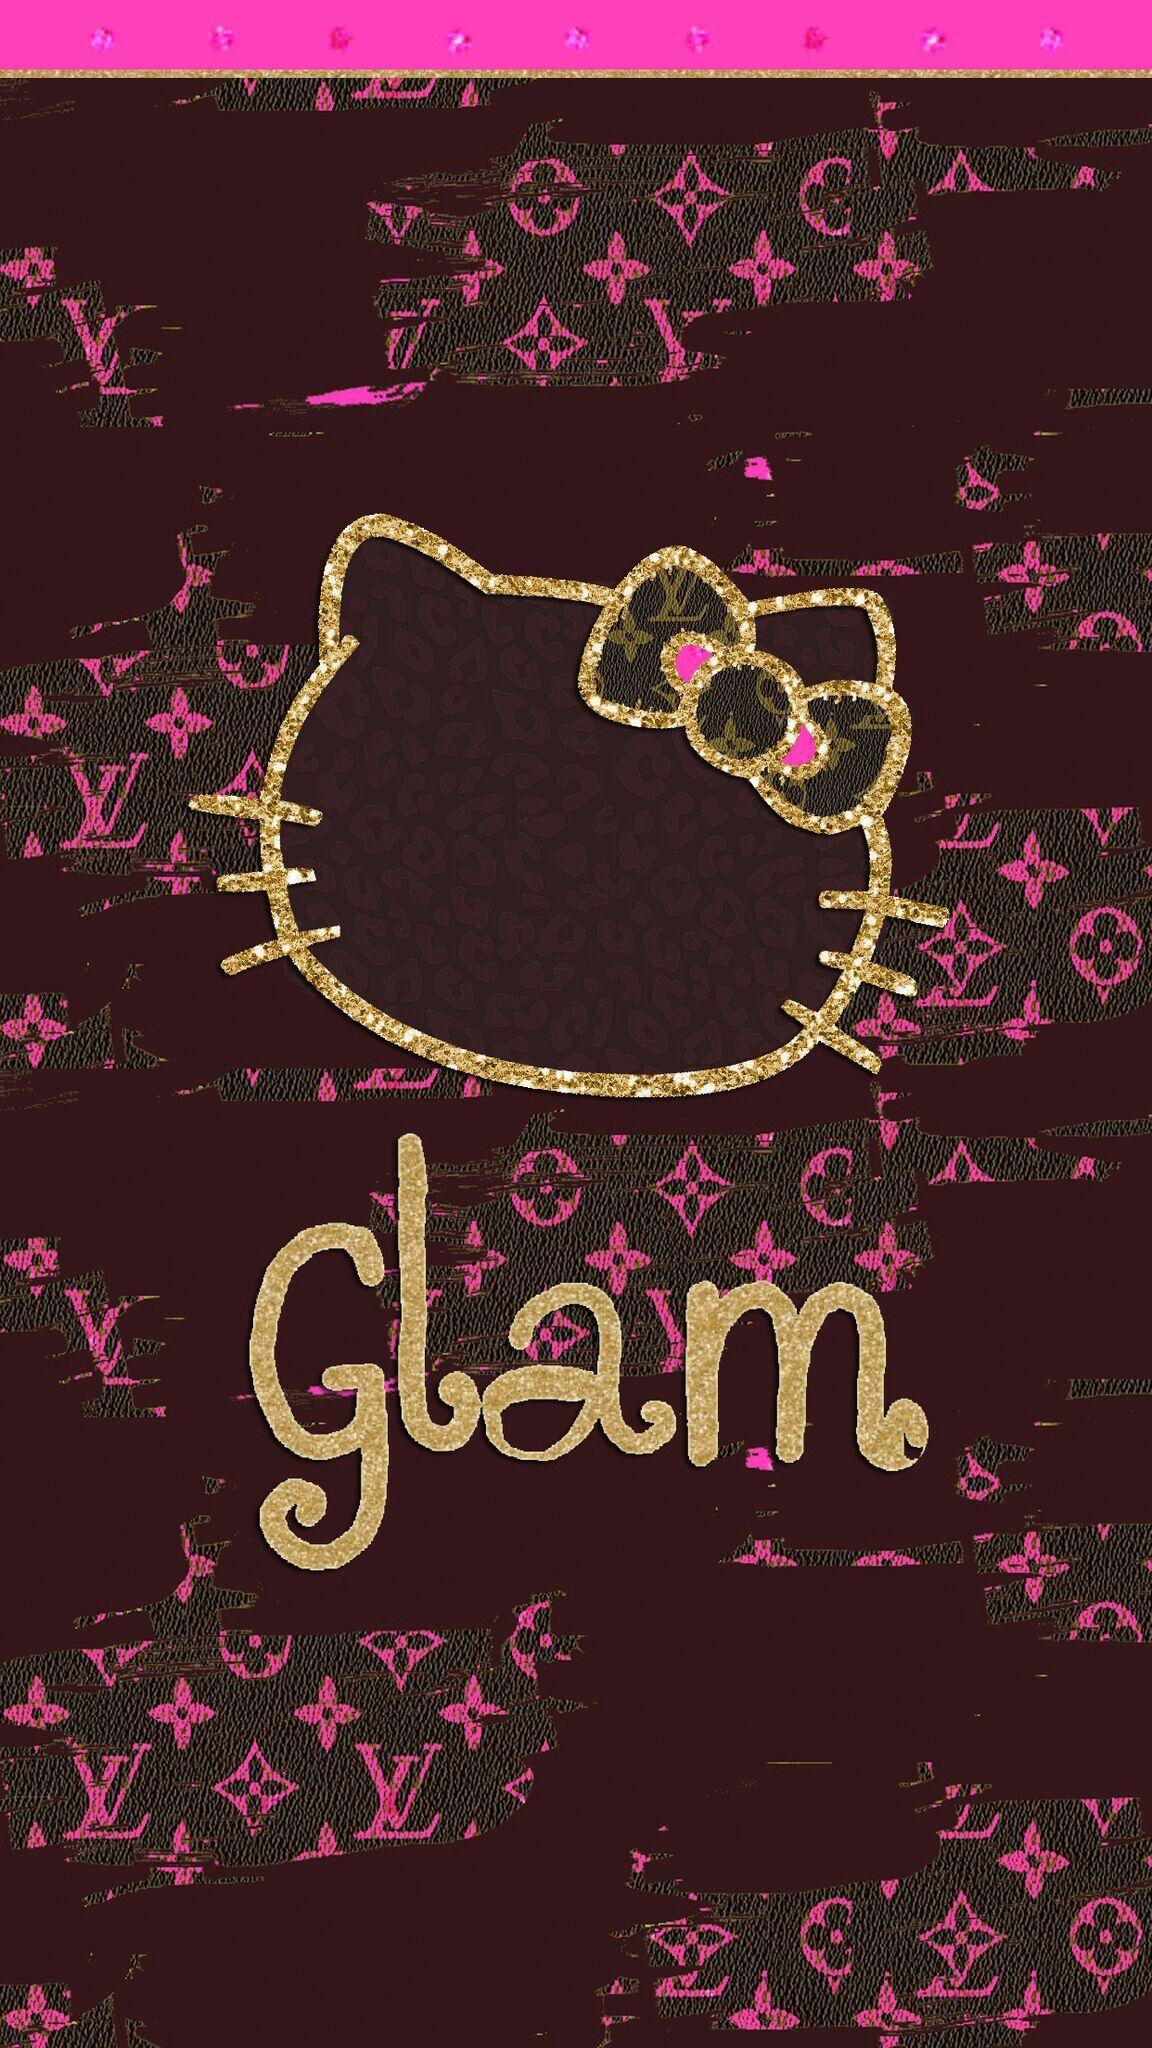 Simple Wallpaper Hello Kitty Ipod Touch - 599475aa41bd8783020ff325fabb79ed  Snapshot_494645.jpg